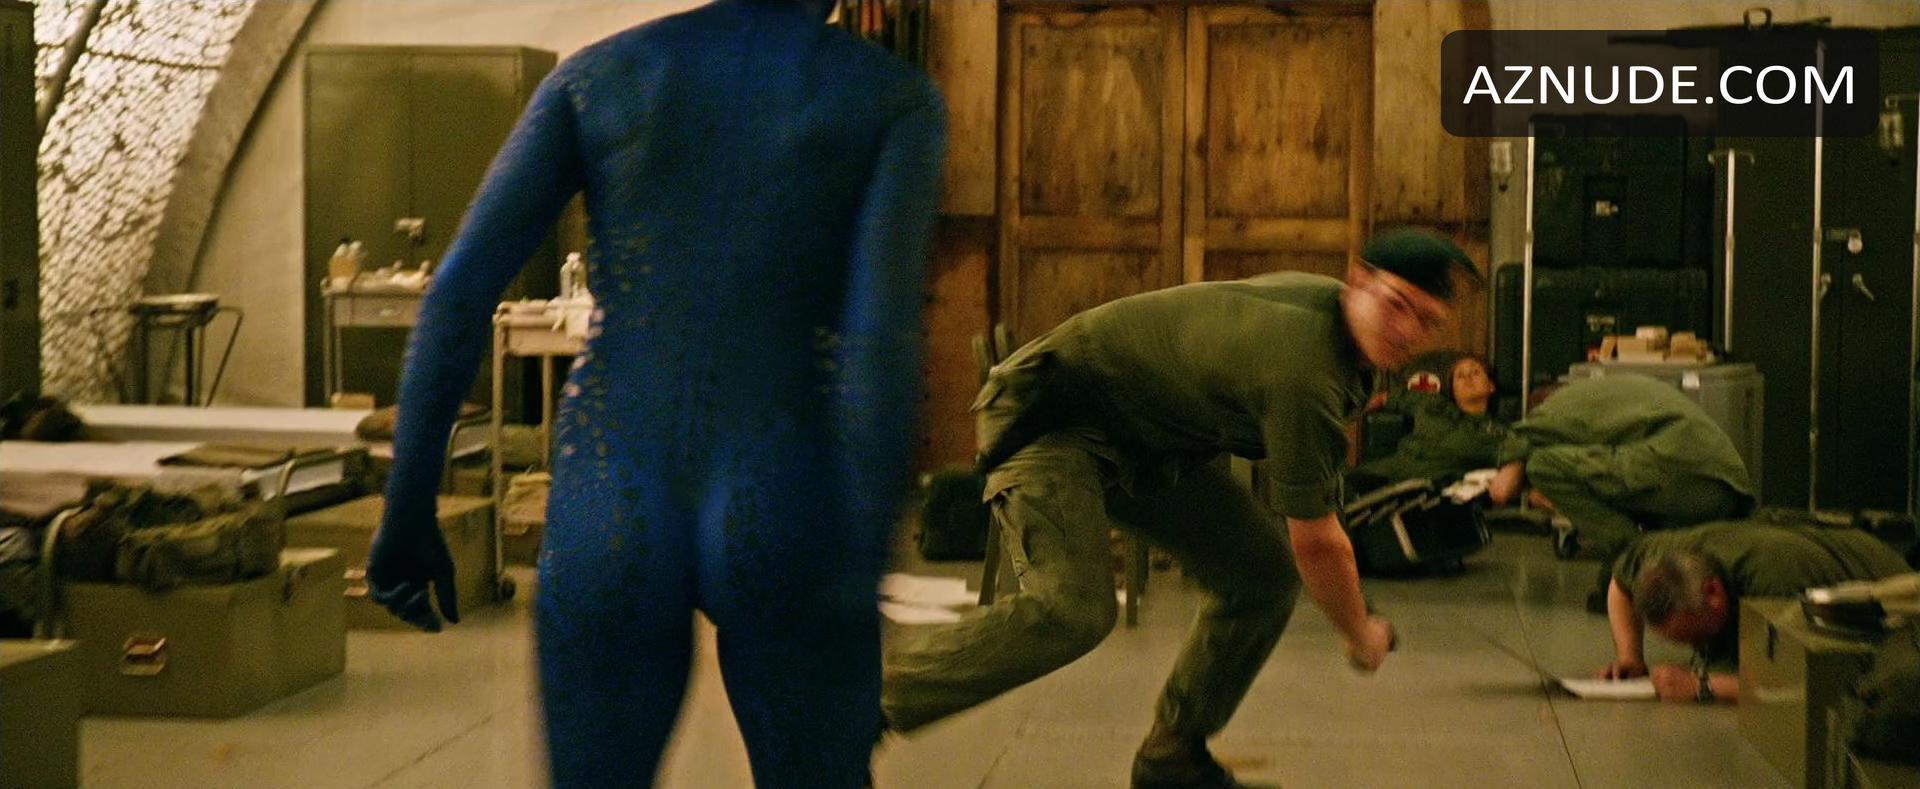 X-Men Days Of Future Past Nude Scenes - Aznude-1296